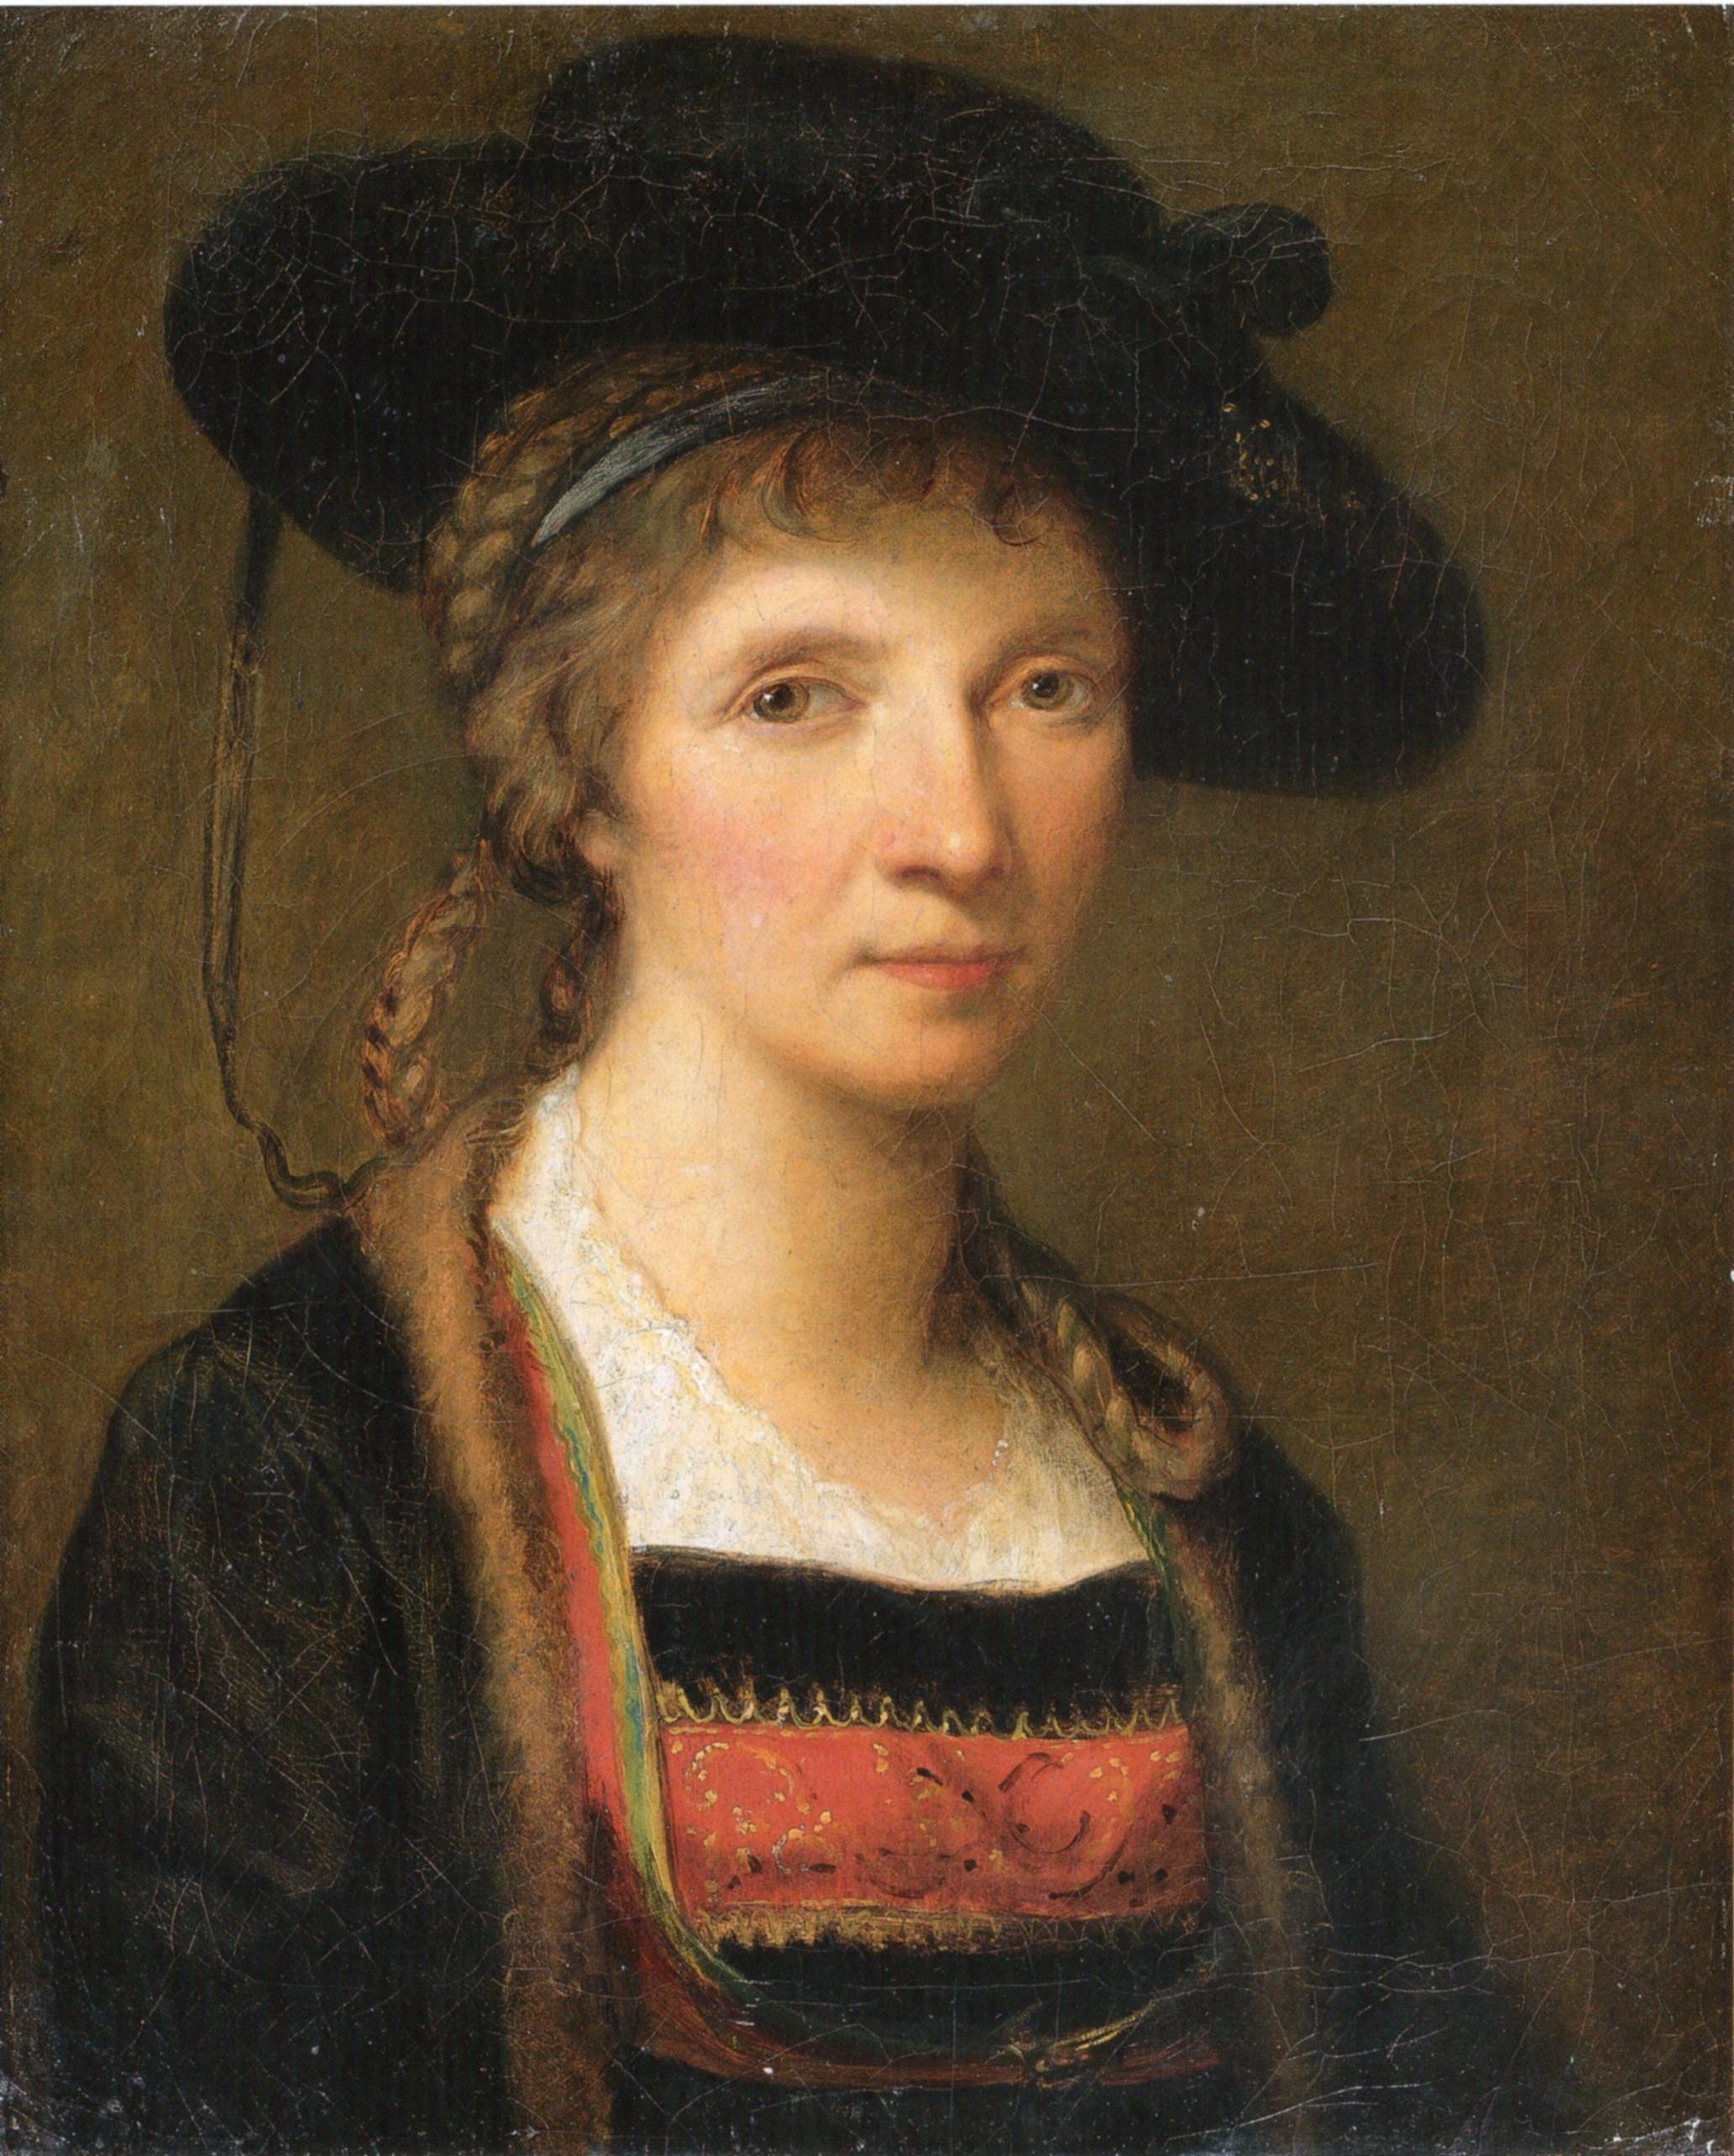 http://upload.wikimedia.org/wikipedia/commons/b/b9/Angelika_Kauffmann_Selbstbildnis_in_Bregenzerw%C3%A4lder_Tracht_1781.jpg?uselang=ru